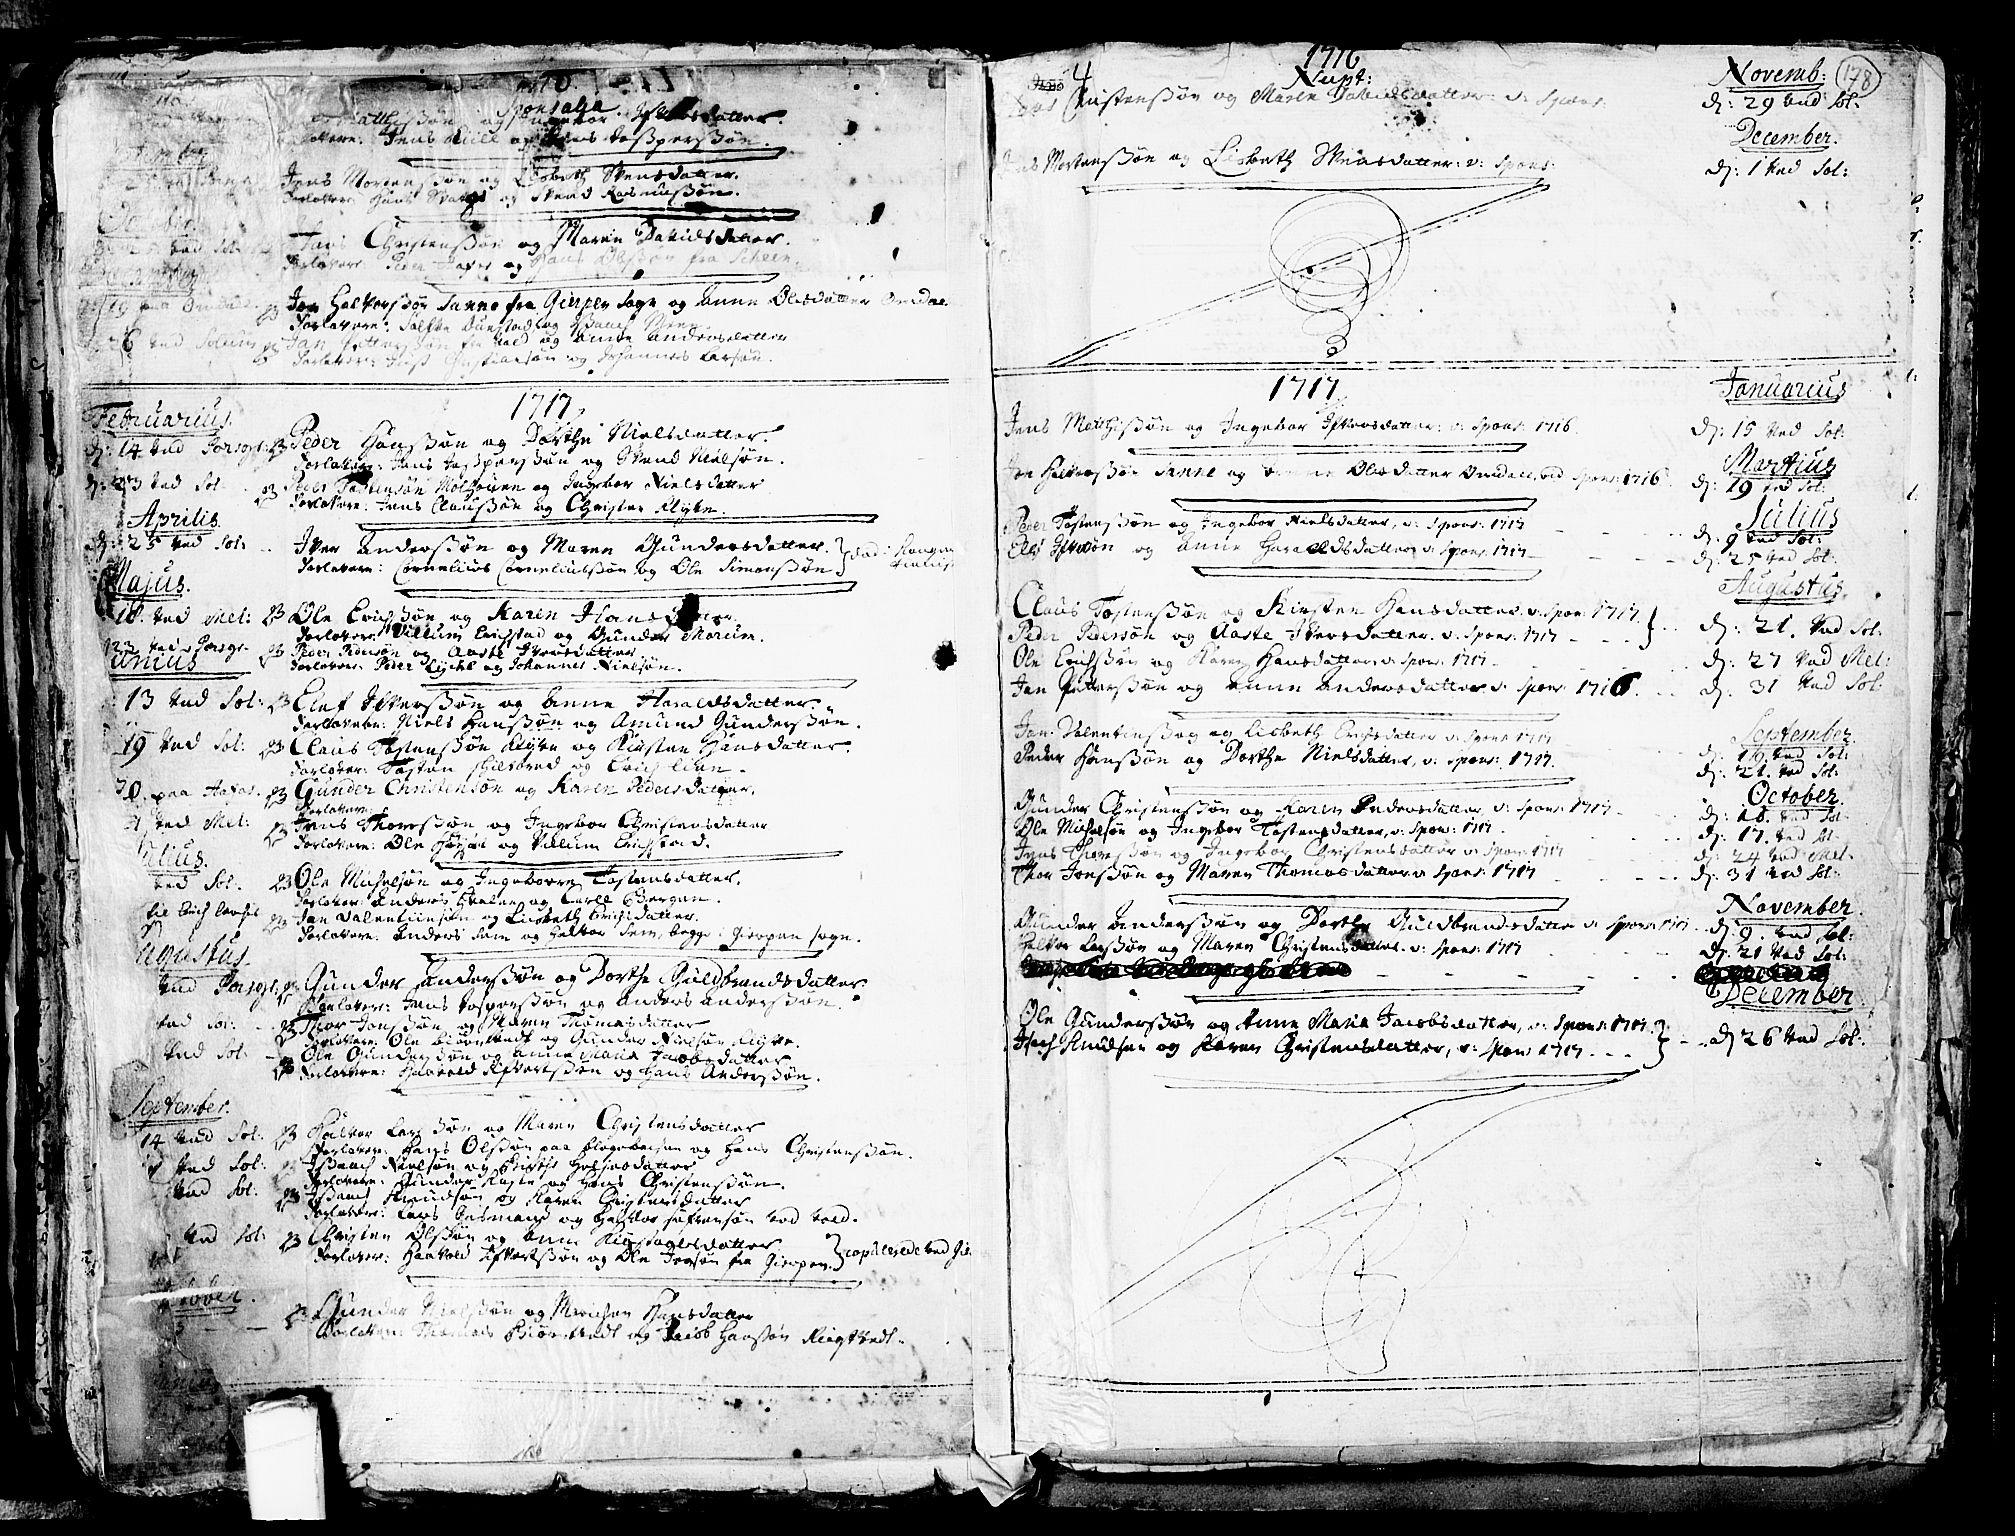 SAKO, Solum kirkebøker, F/Fa/L0002: Ministerialbok nr. I 2, 1713-1761, s. 178